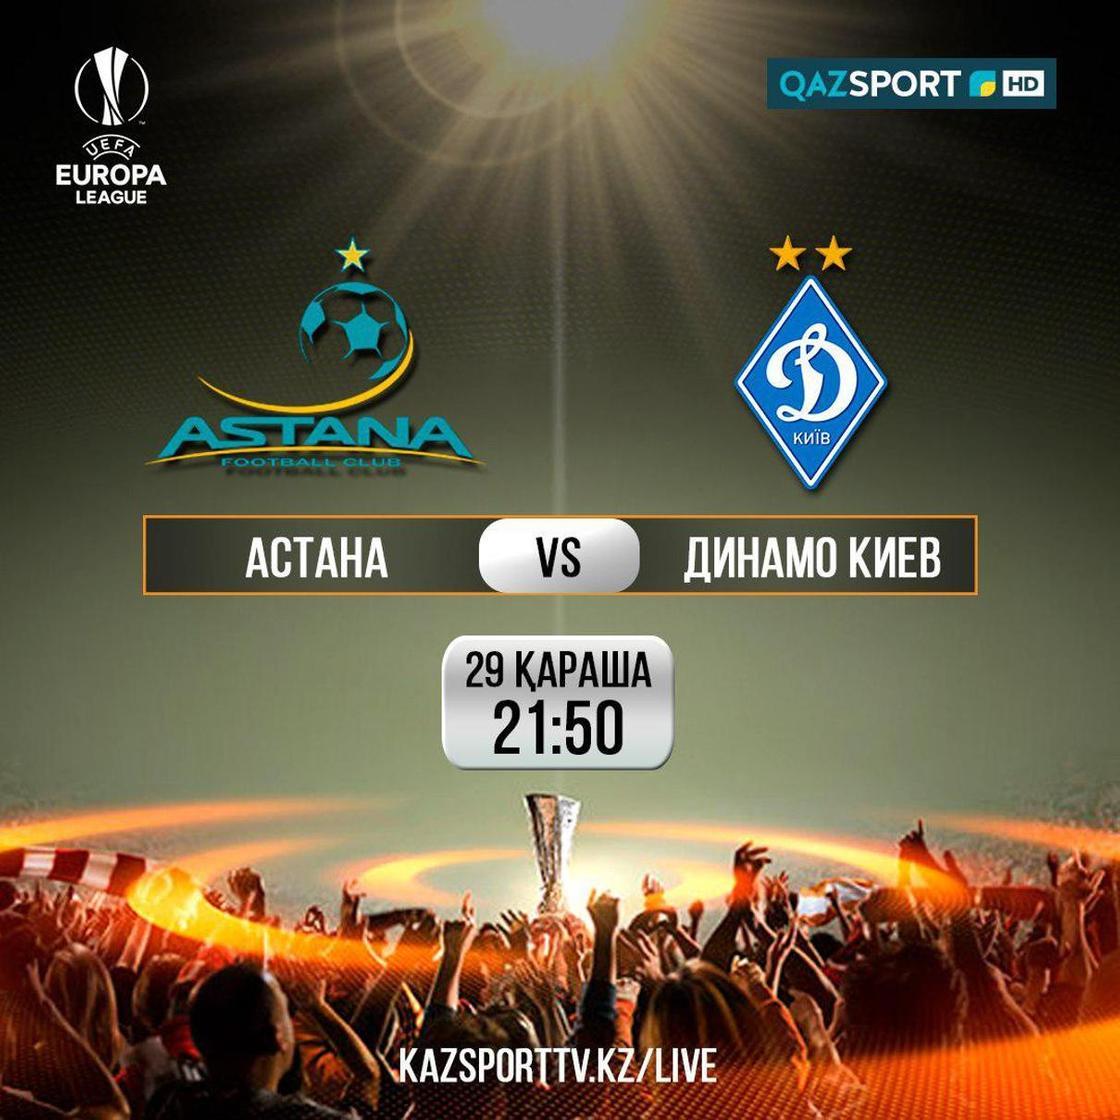 Телеканал «QAZSPORT» покажет прямую трансляцию матча «Астана» - «Динамо»